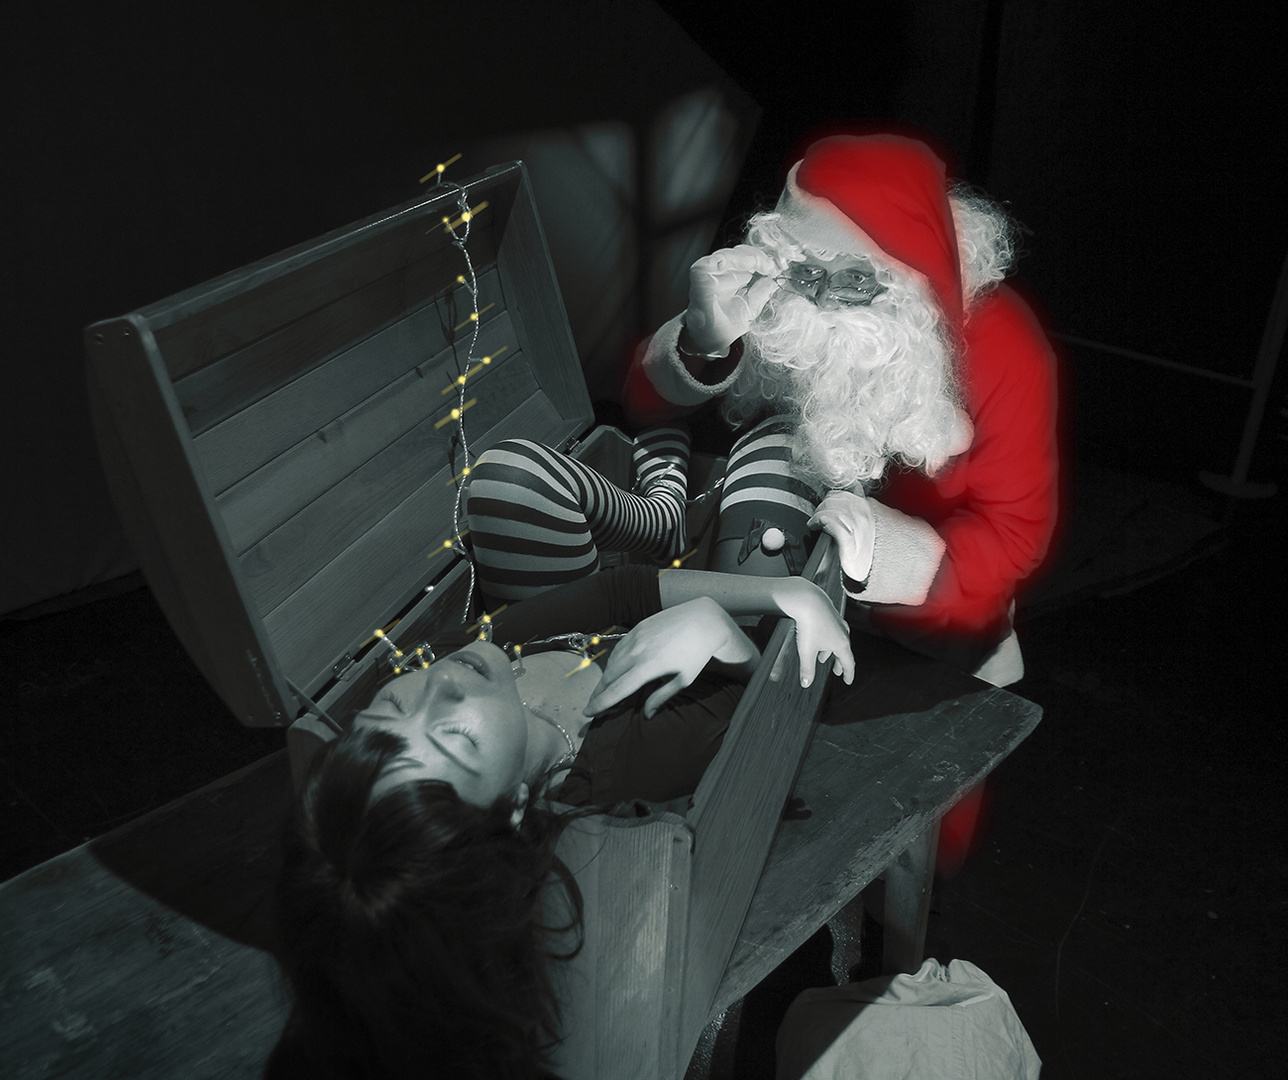 """Diario intimo de Papá Noel"" lll"